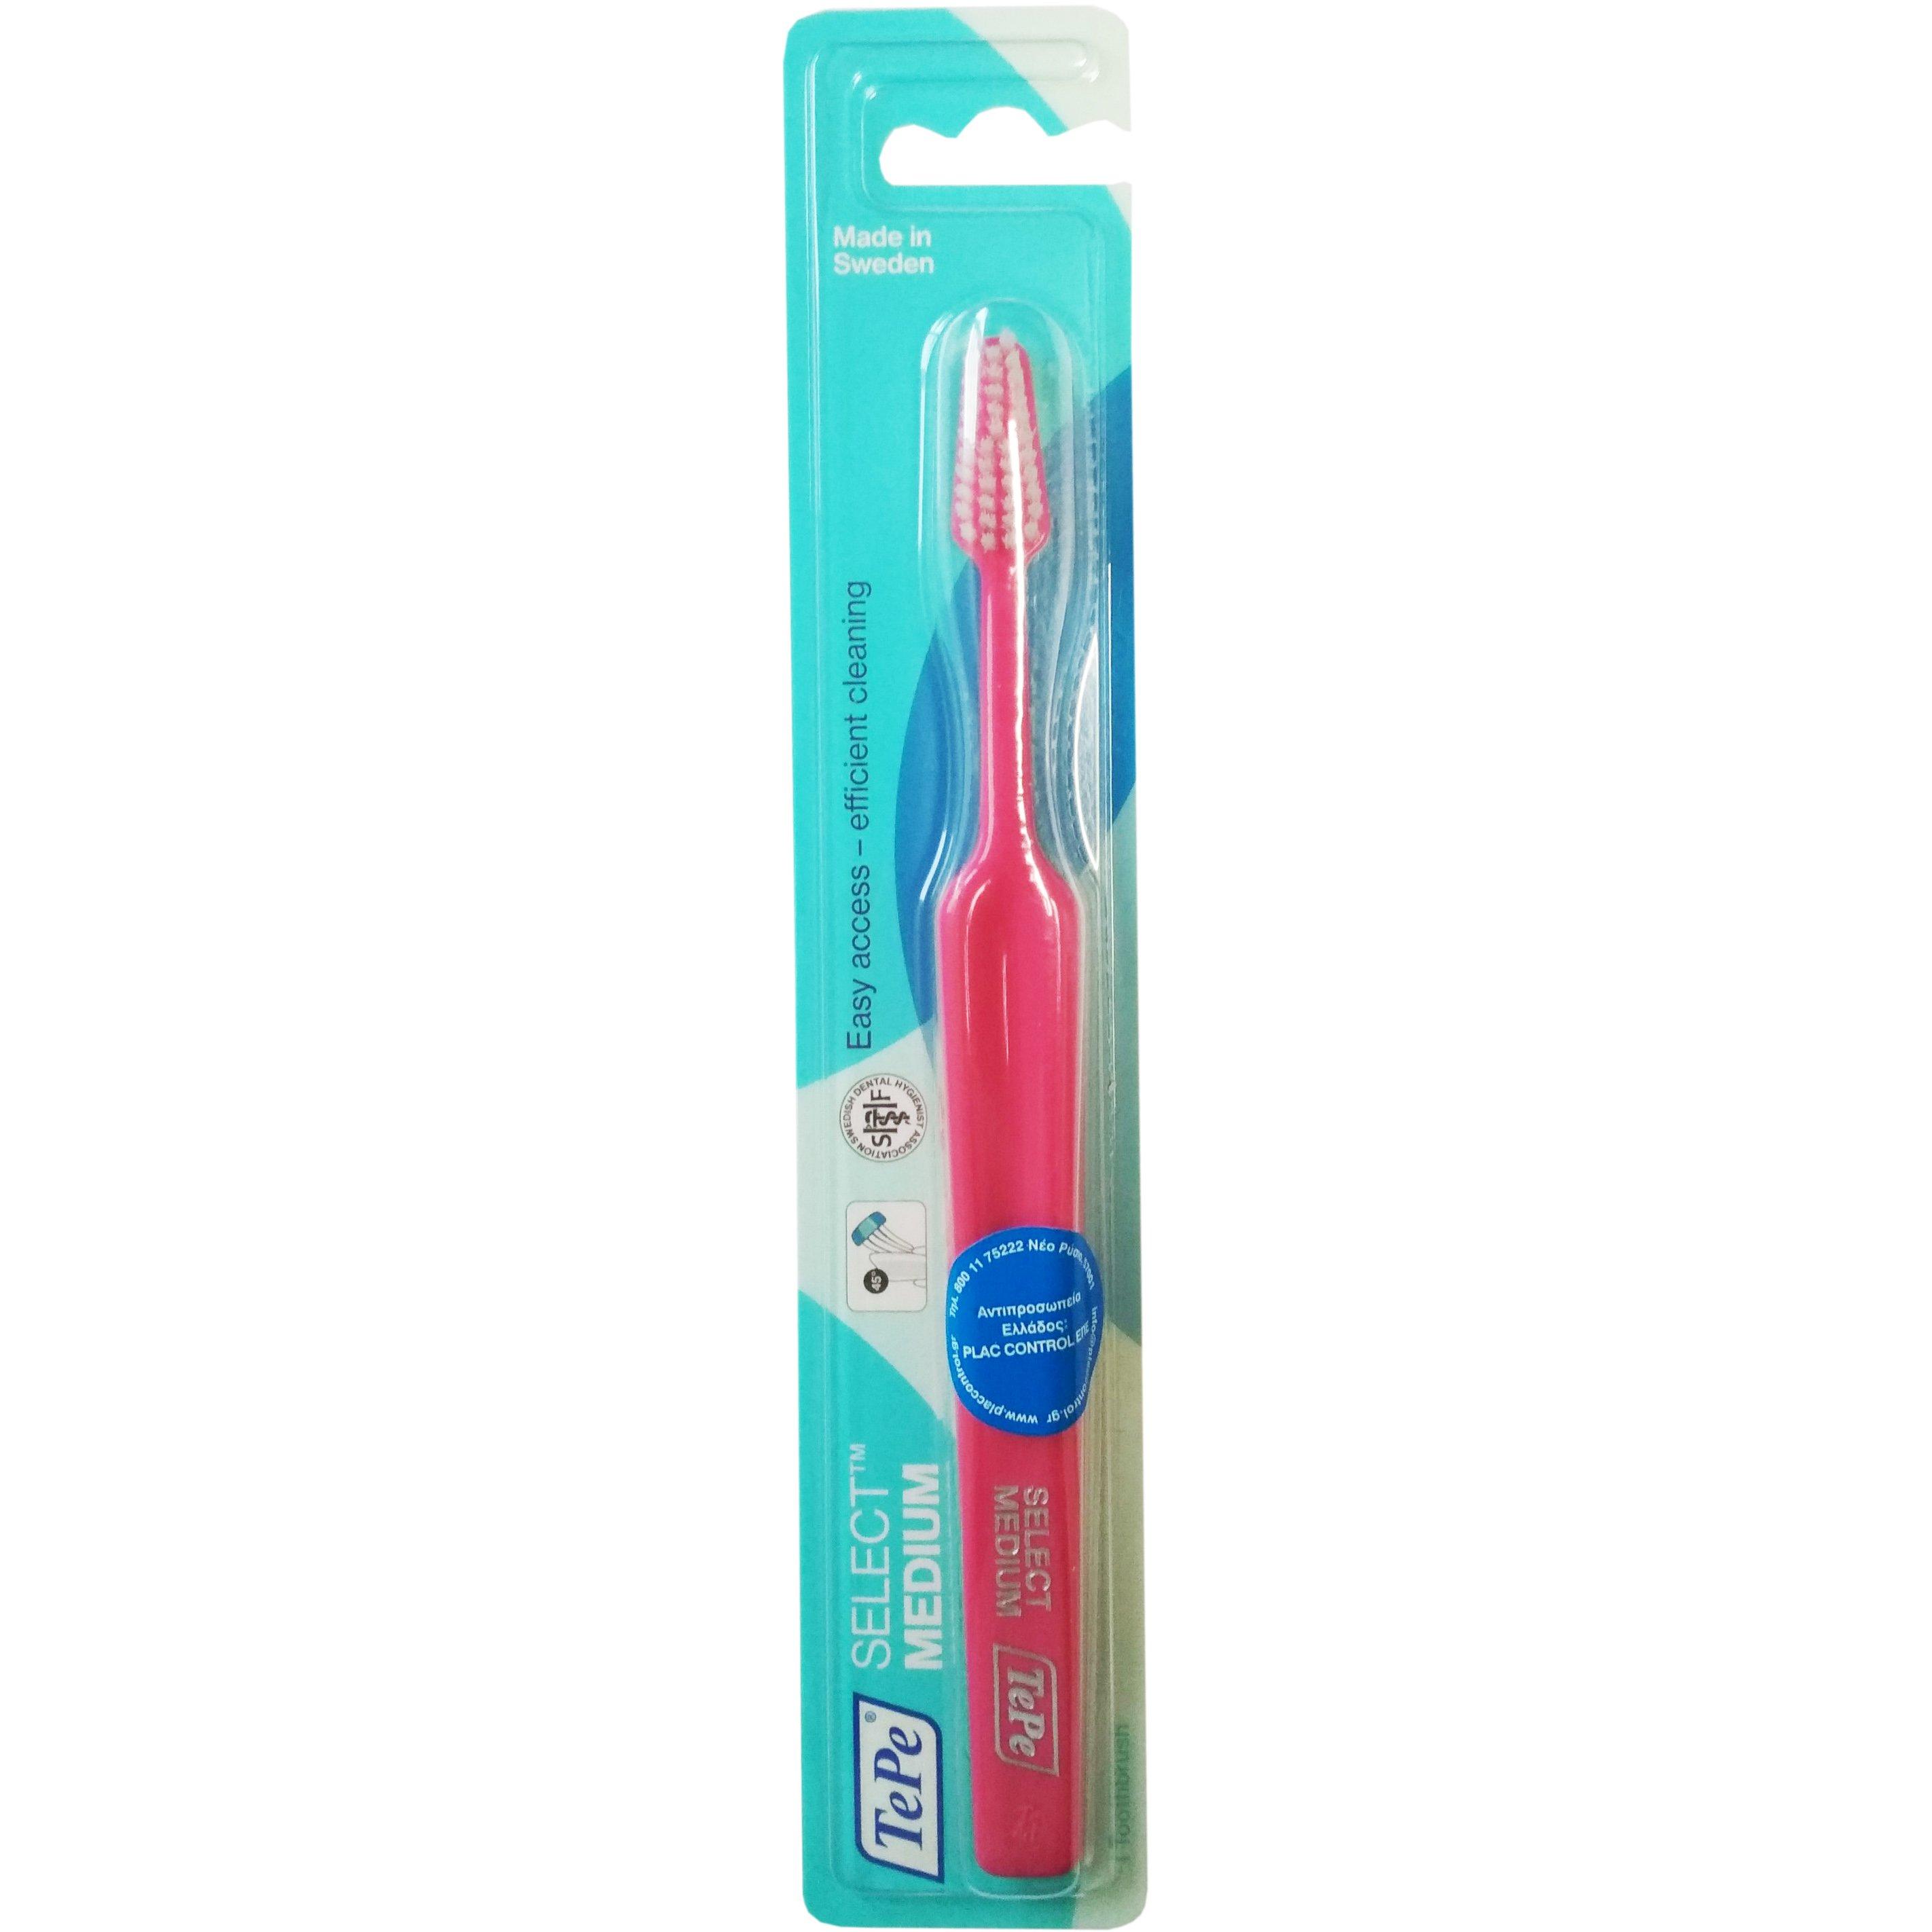 Tepe Select Medium Οδοντόβουρτσα Μέτρια για Εύκολη Πρόσβαση στα Πίσω Δόντια & Αποτελεσματικό Καθαρισμό 1 Τεμάχιο – φούξια